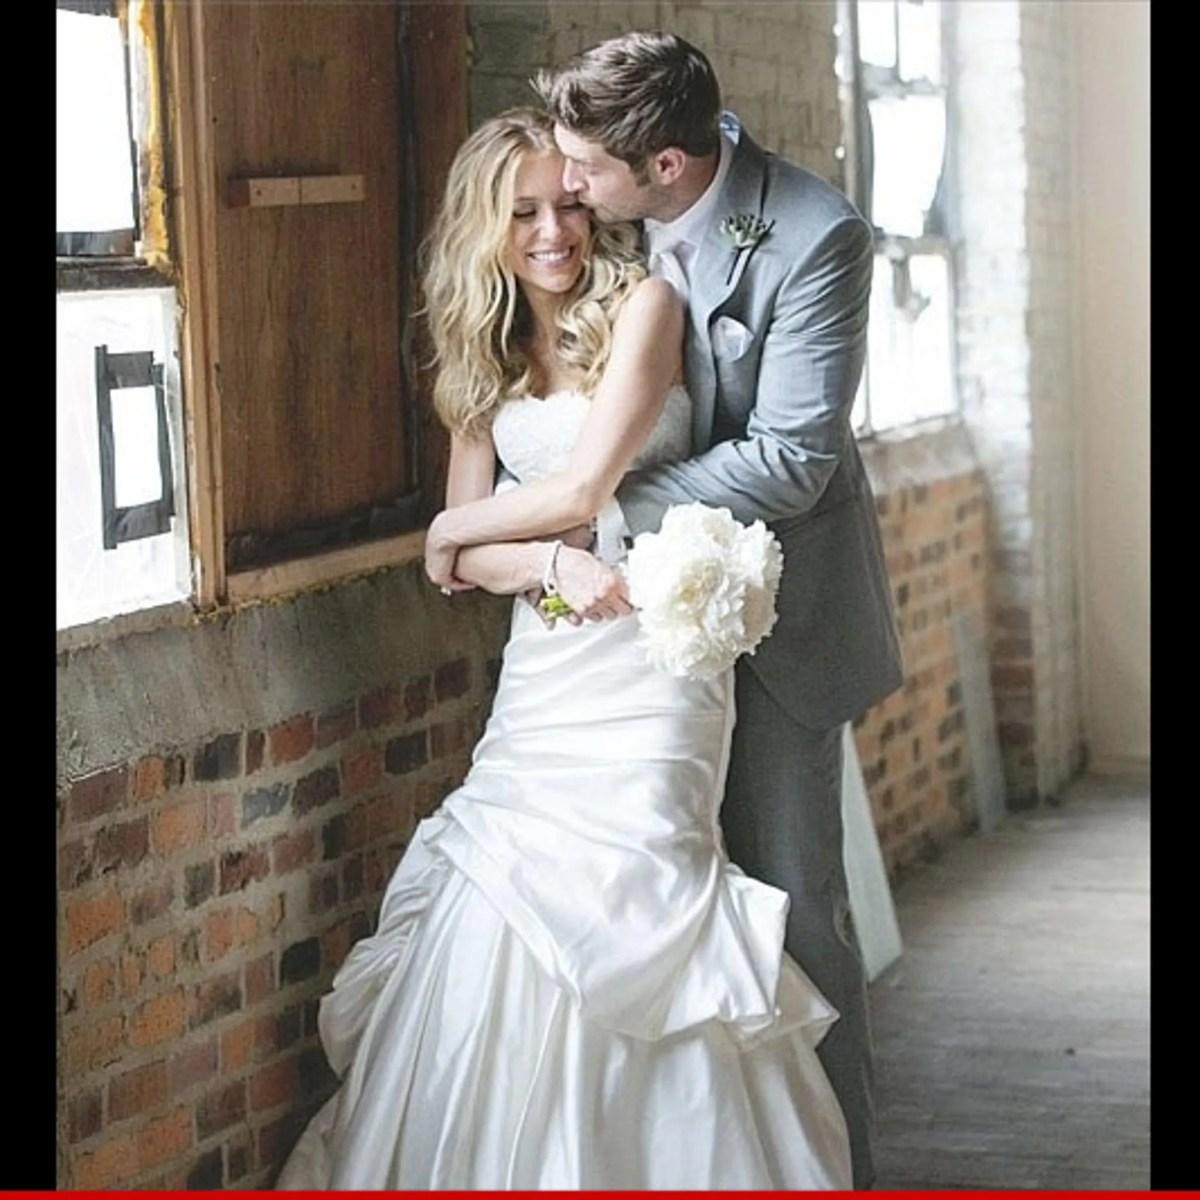 Jay Cutler & Kristin Cavallari Wedding Photo -- If At First You Don't  Succeed ...